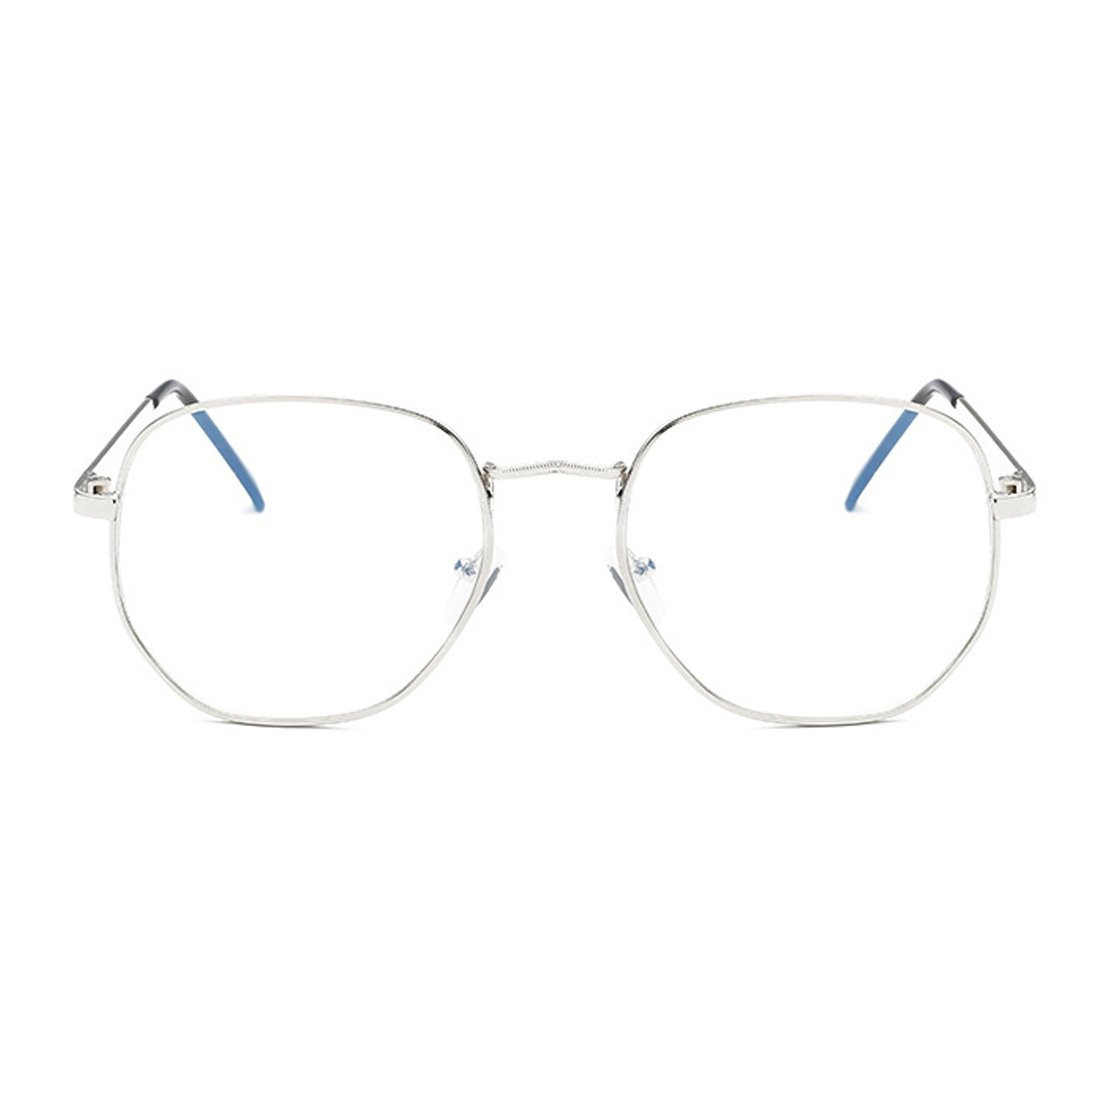 Huicai Fashion Myopie Brille Facelifting Brille Metall ...